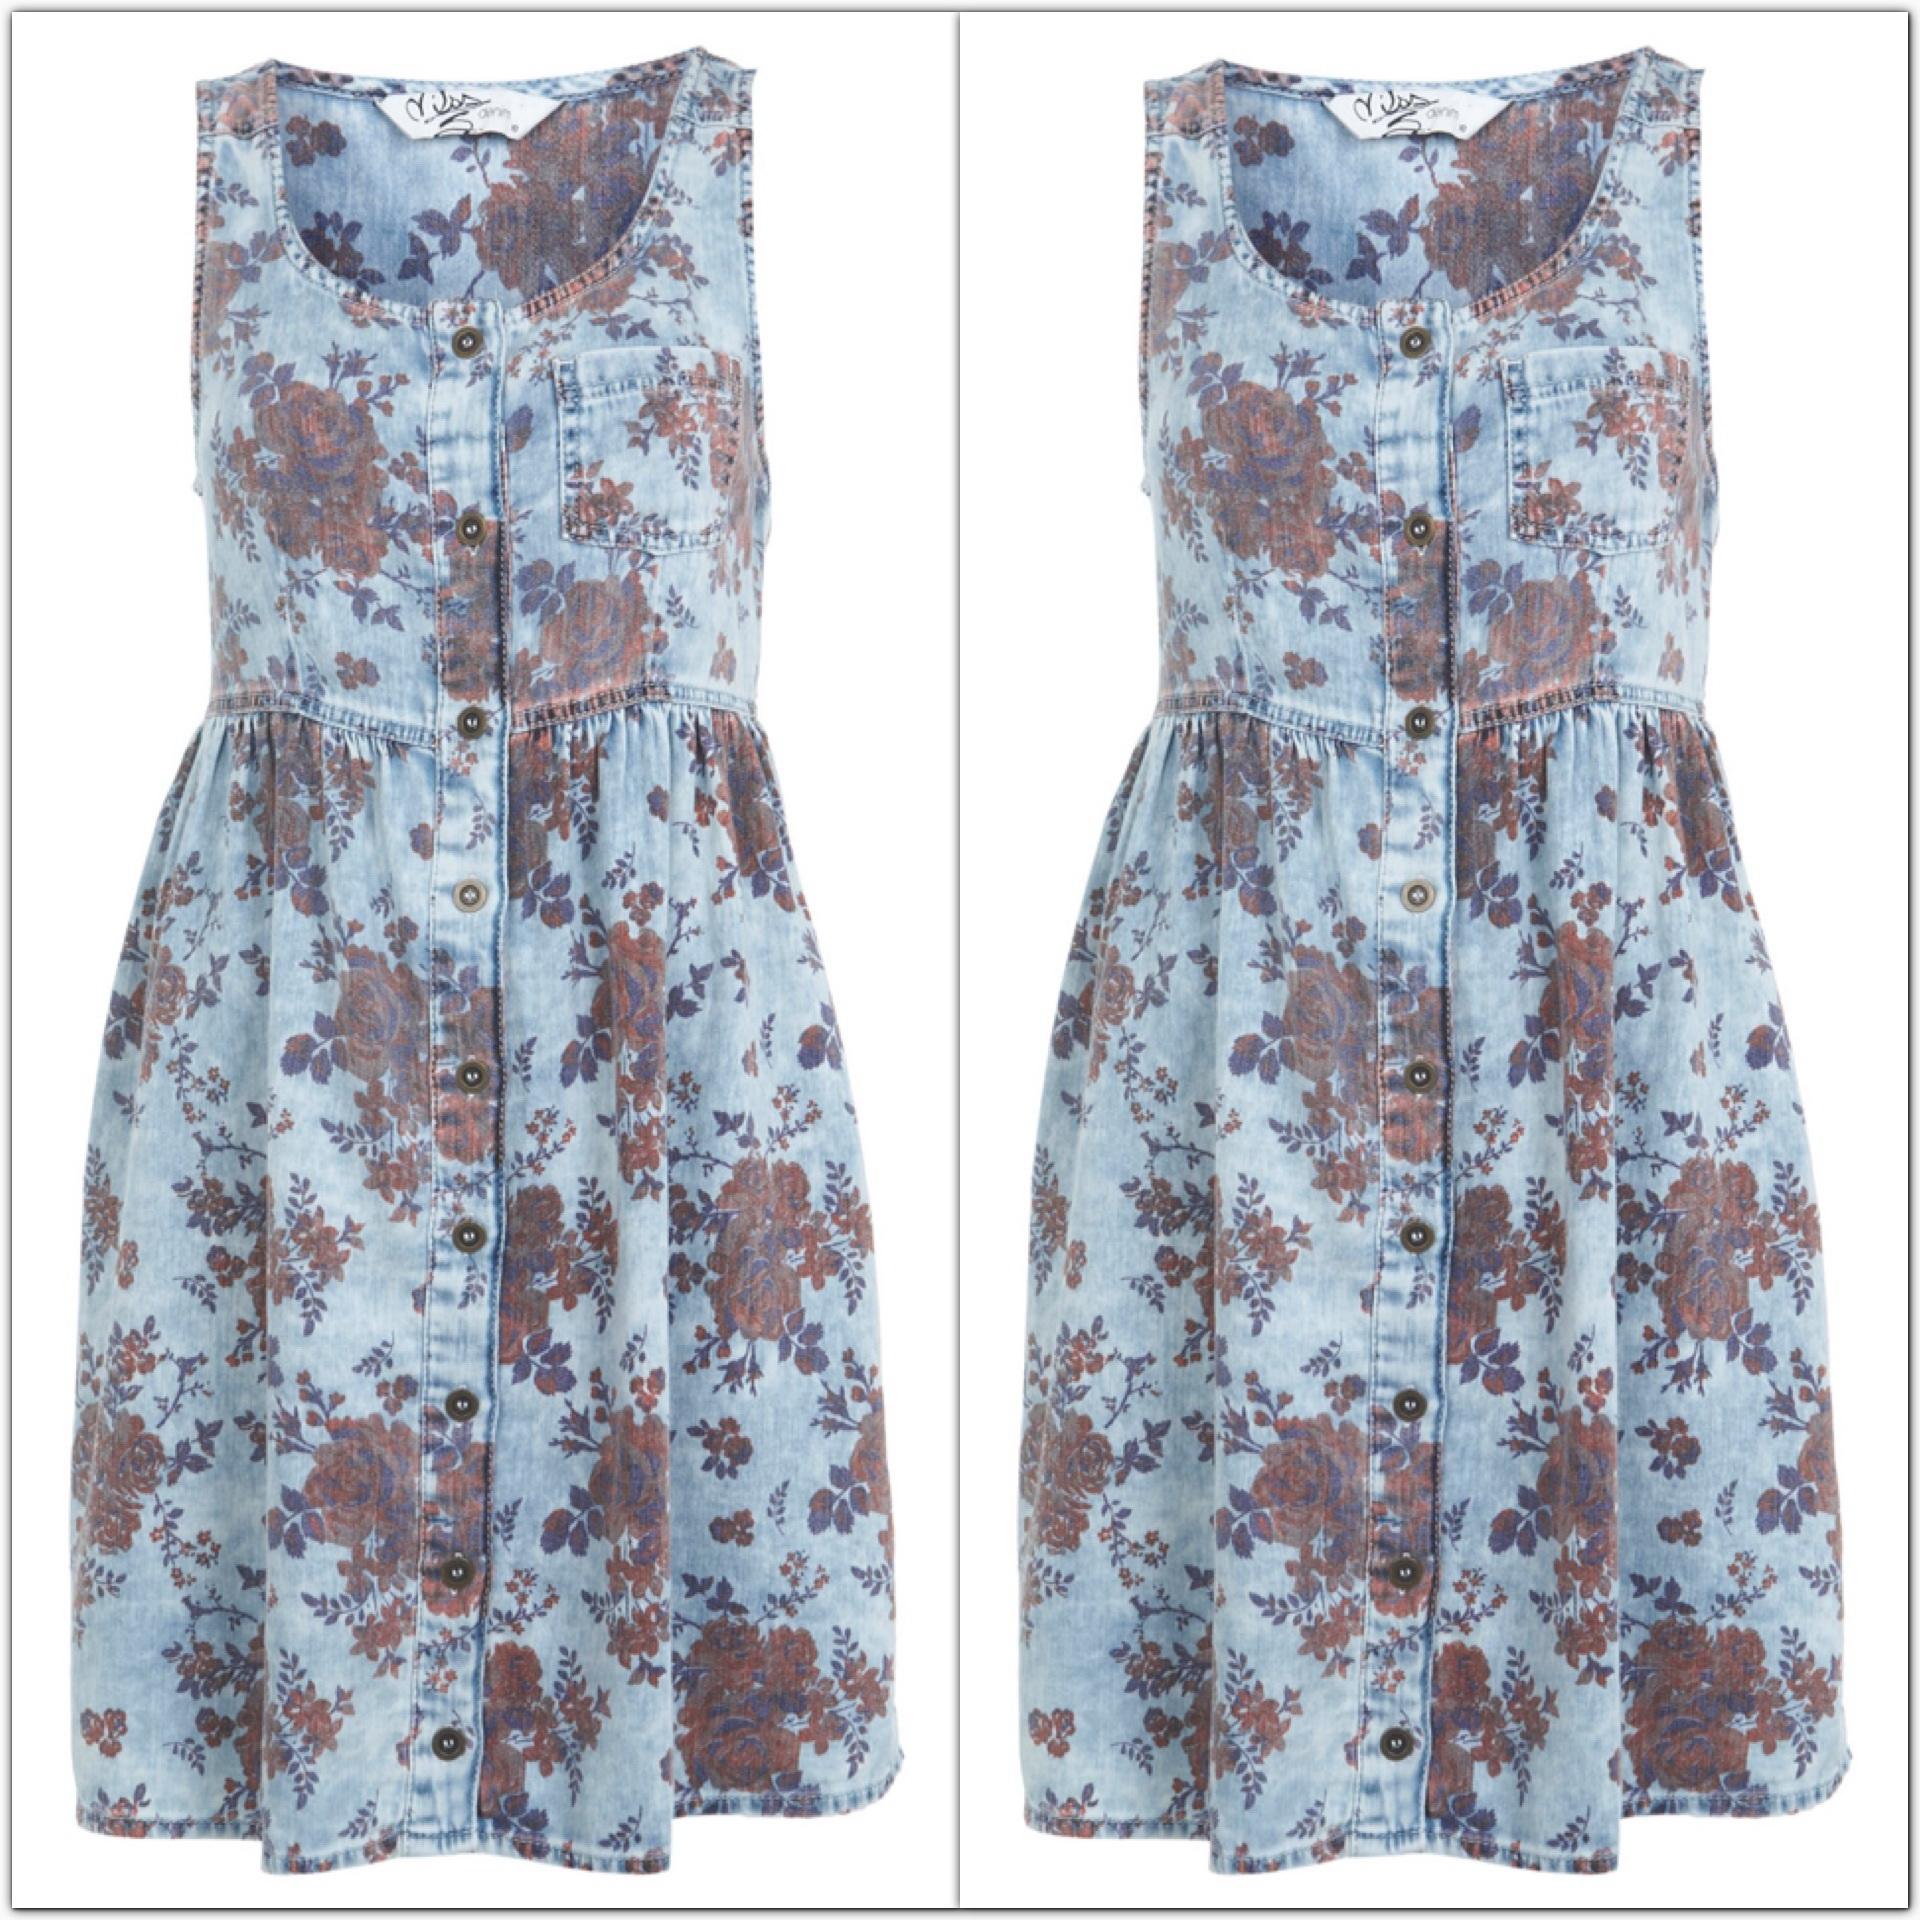 Miss Selfridge Floral Denim Dress size uk8=1 uk10=1 uk12=1